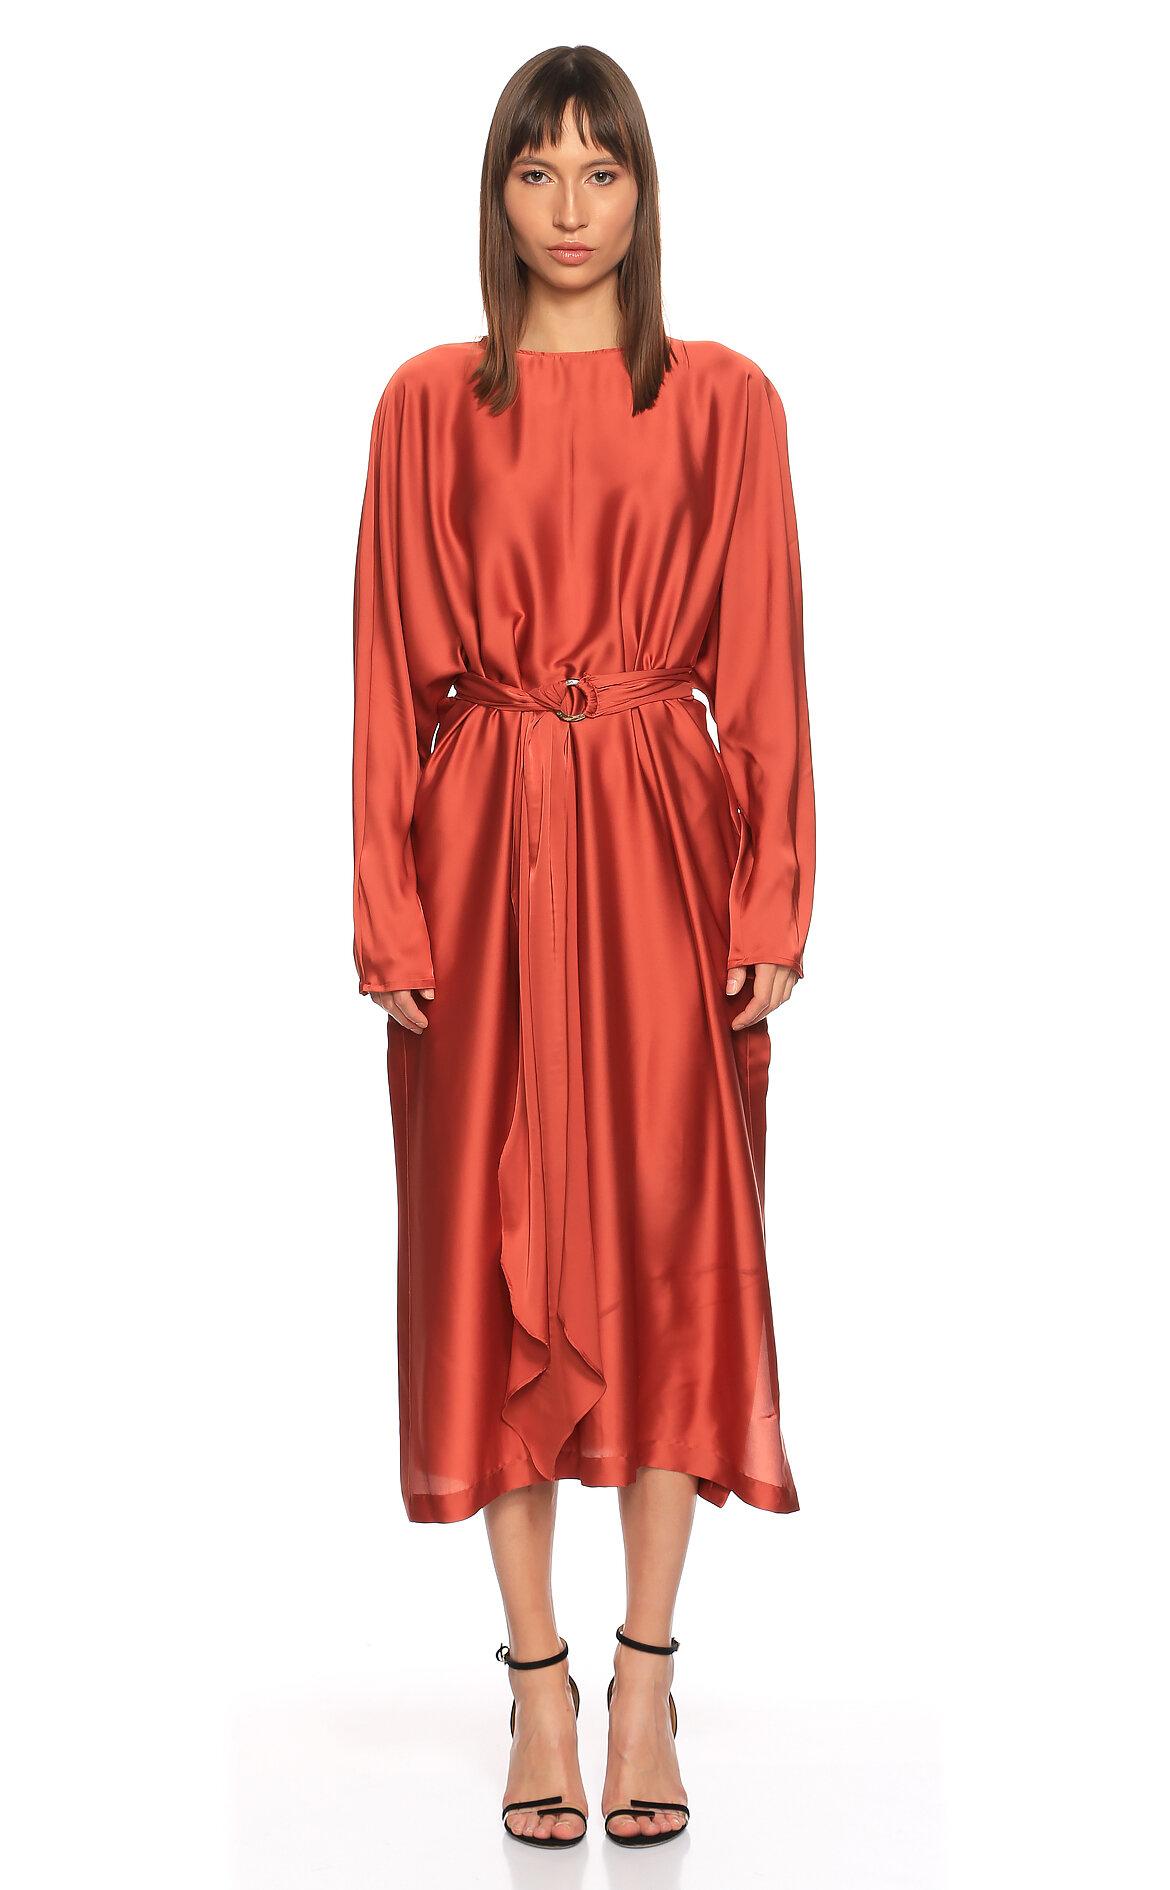 Nazlı Ceren-Nazlı Ceren Saten Midi Kiremit Elbise